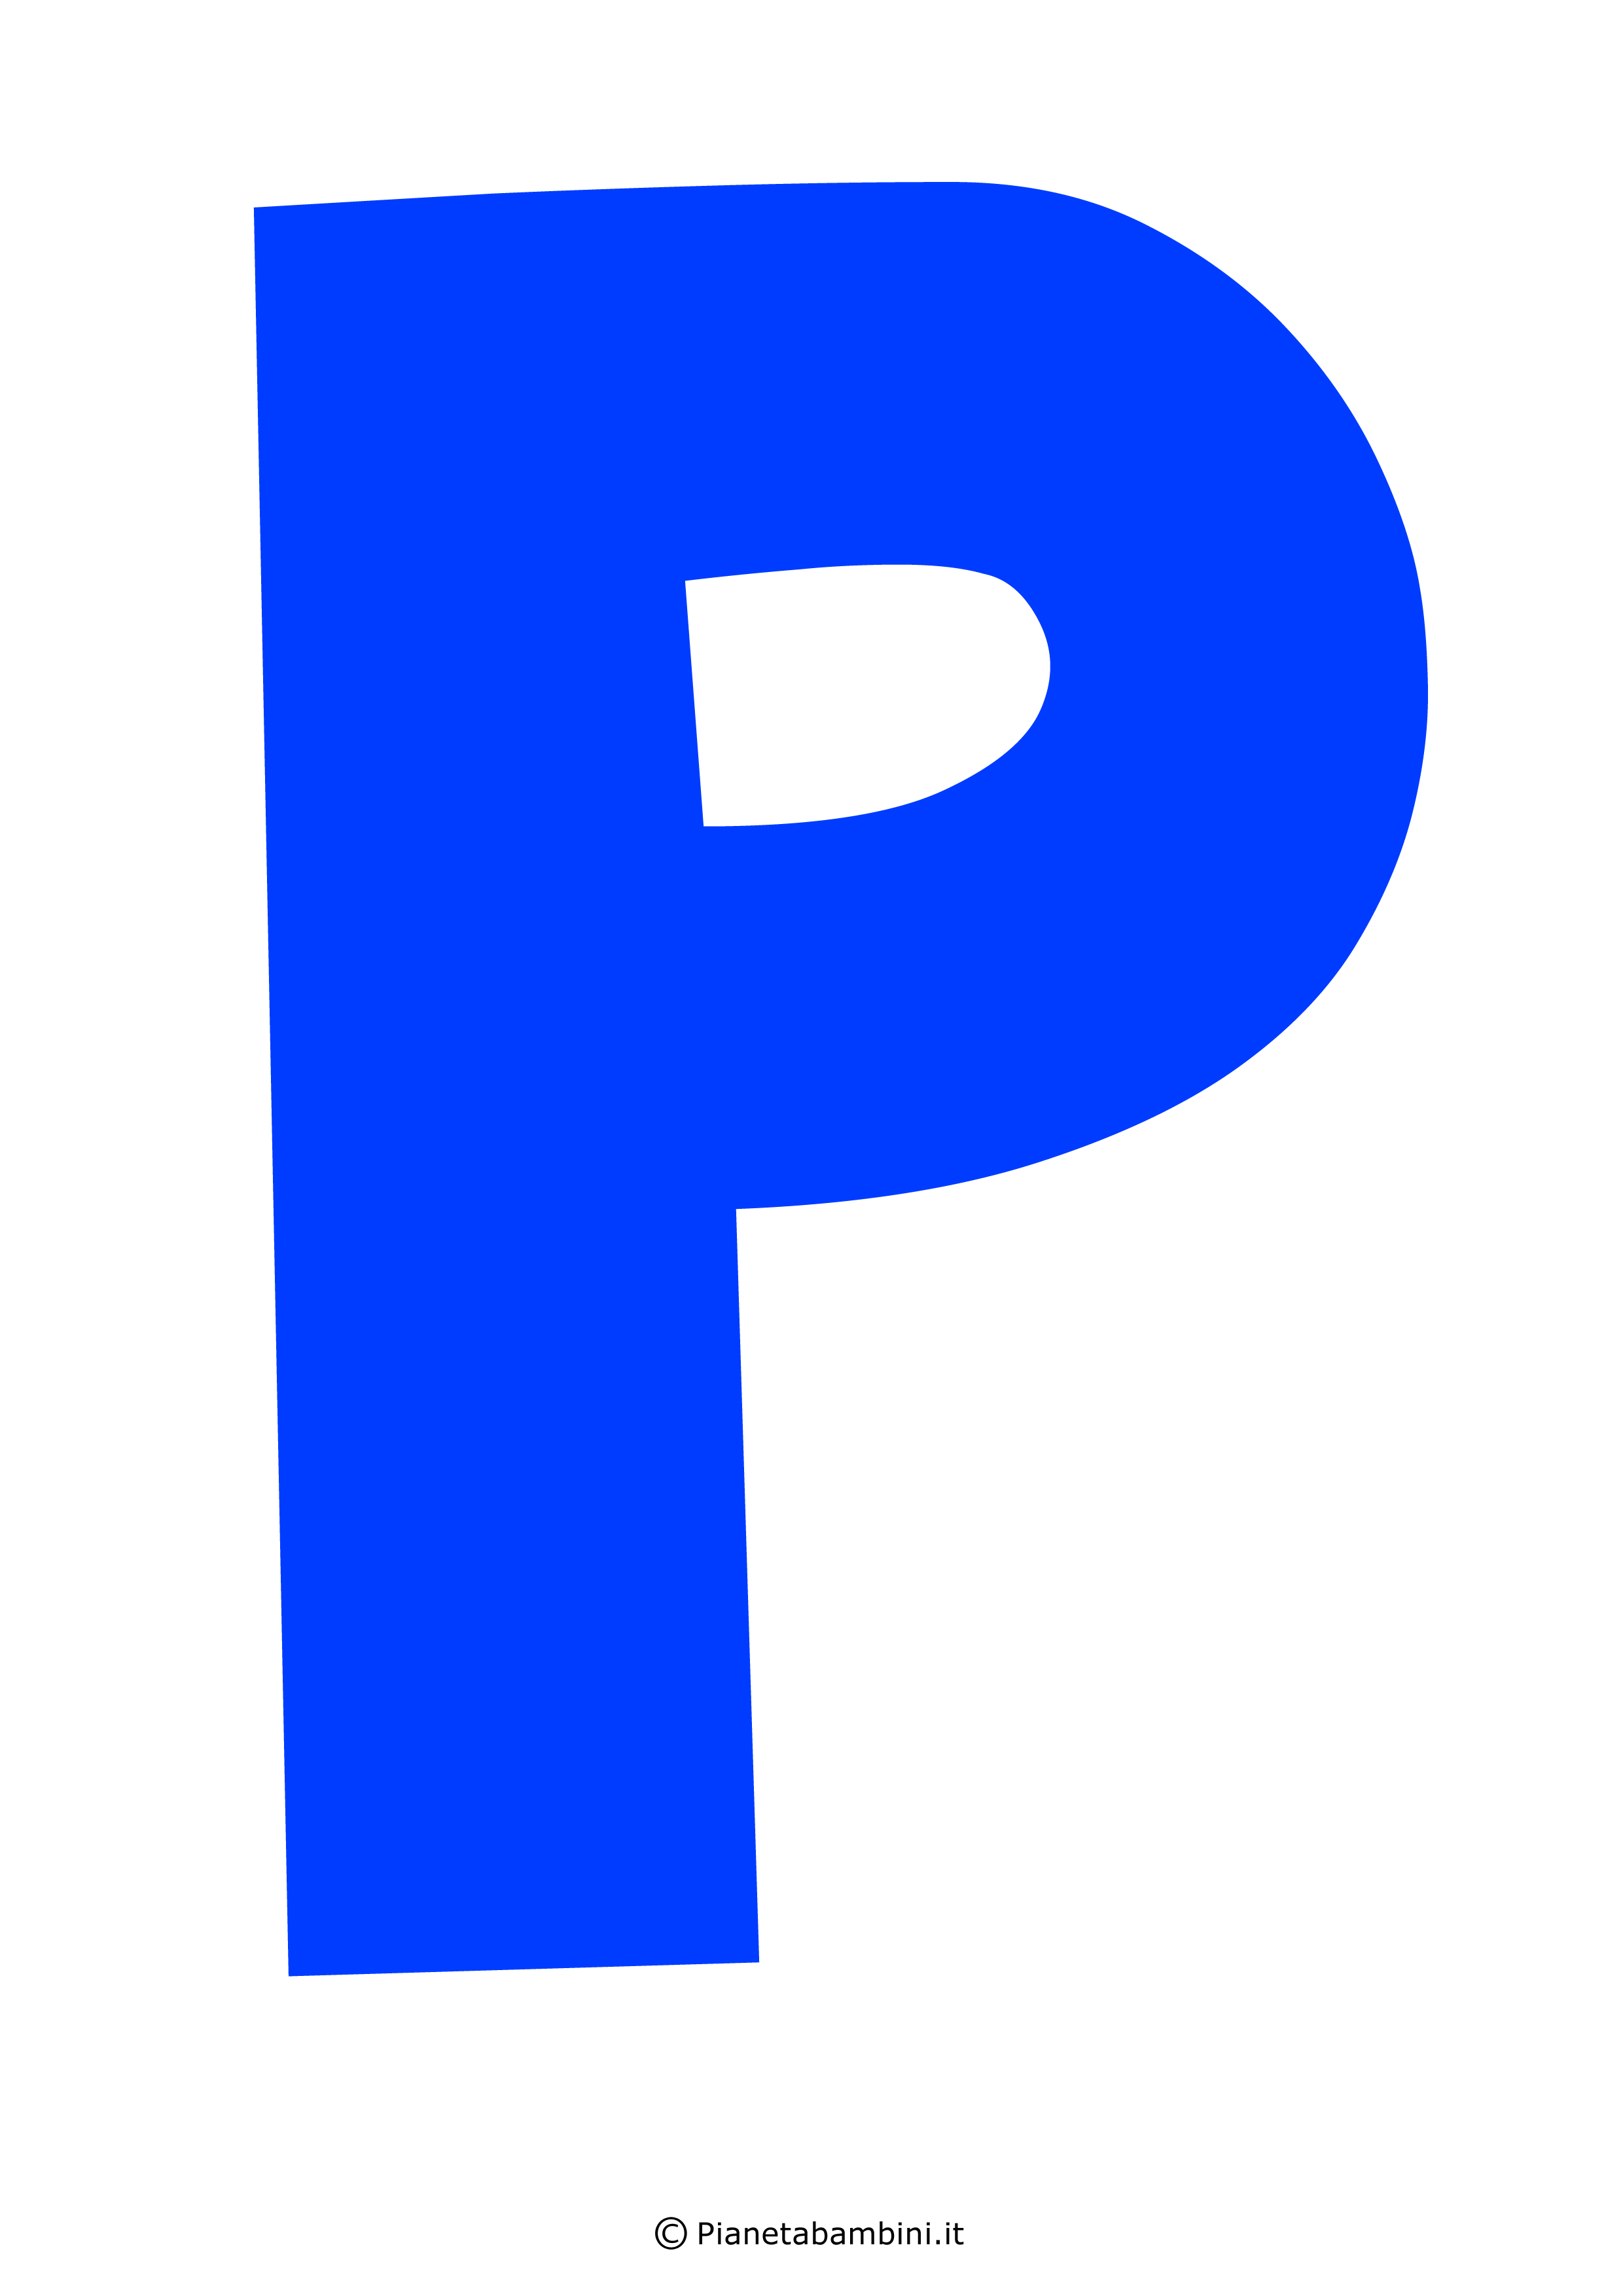 Lettera p blu pianetabambini pianetabambini data 4 luglio 2014 autore michela categorie thecheapjerseys Choice Image